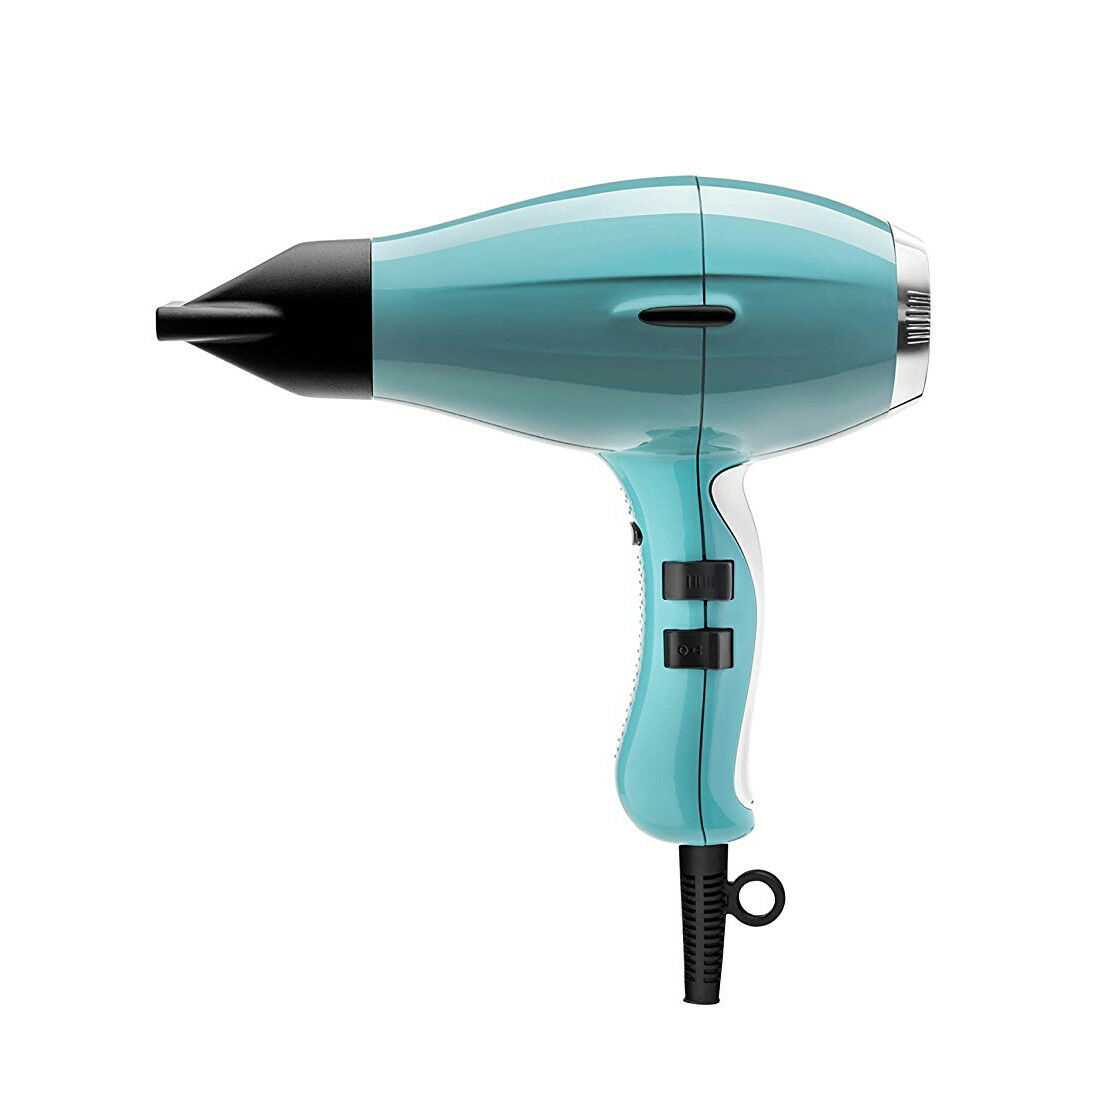 Elchim Light 3900 Ionic Ceramic Hair Dryer Retro Fifties  Bl